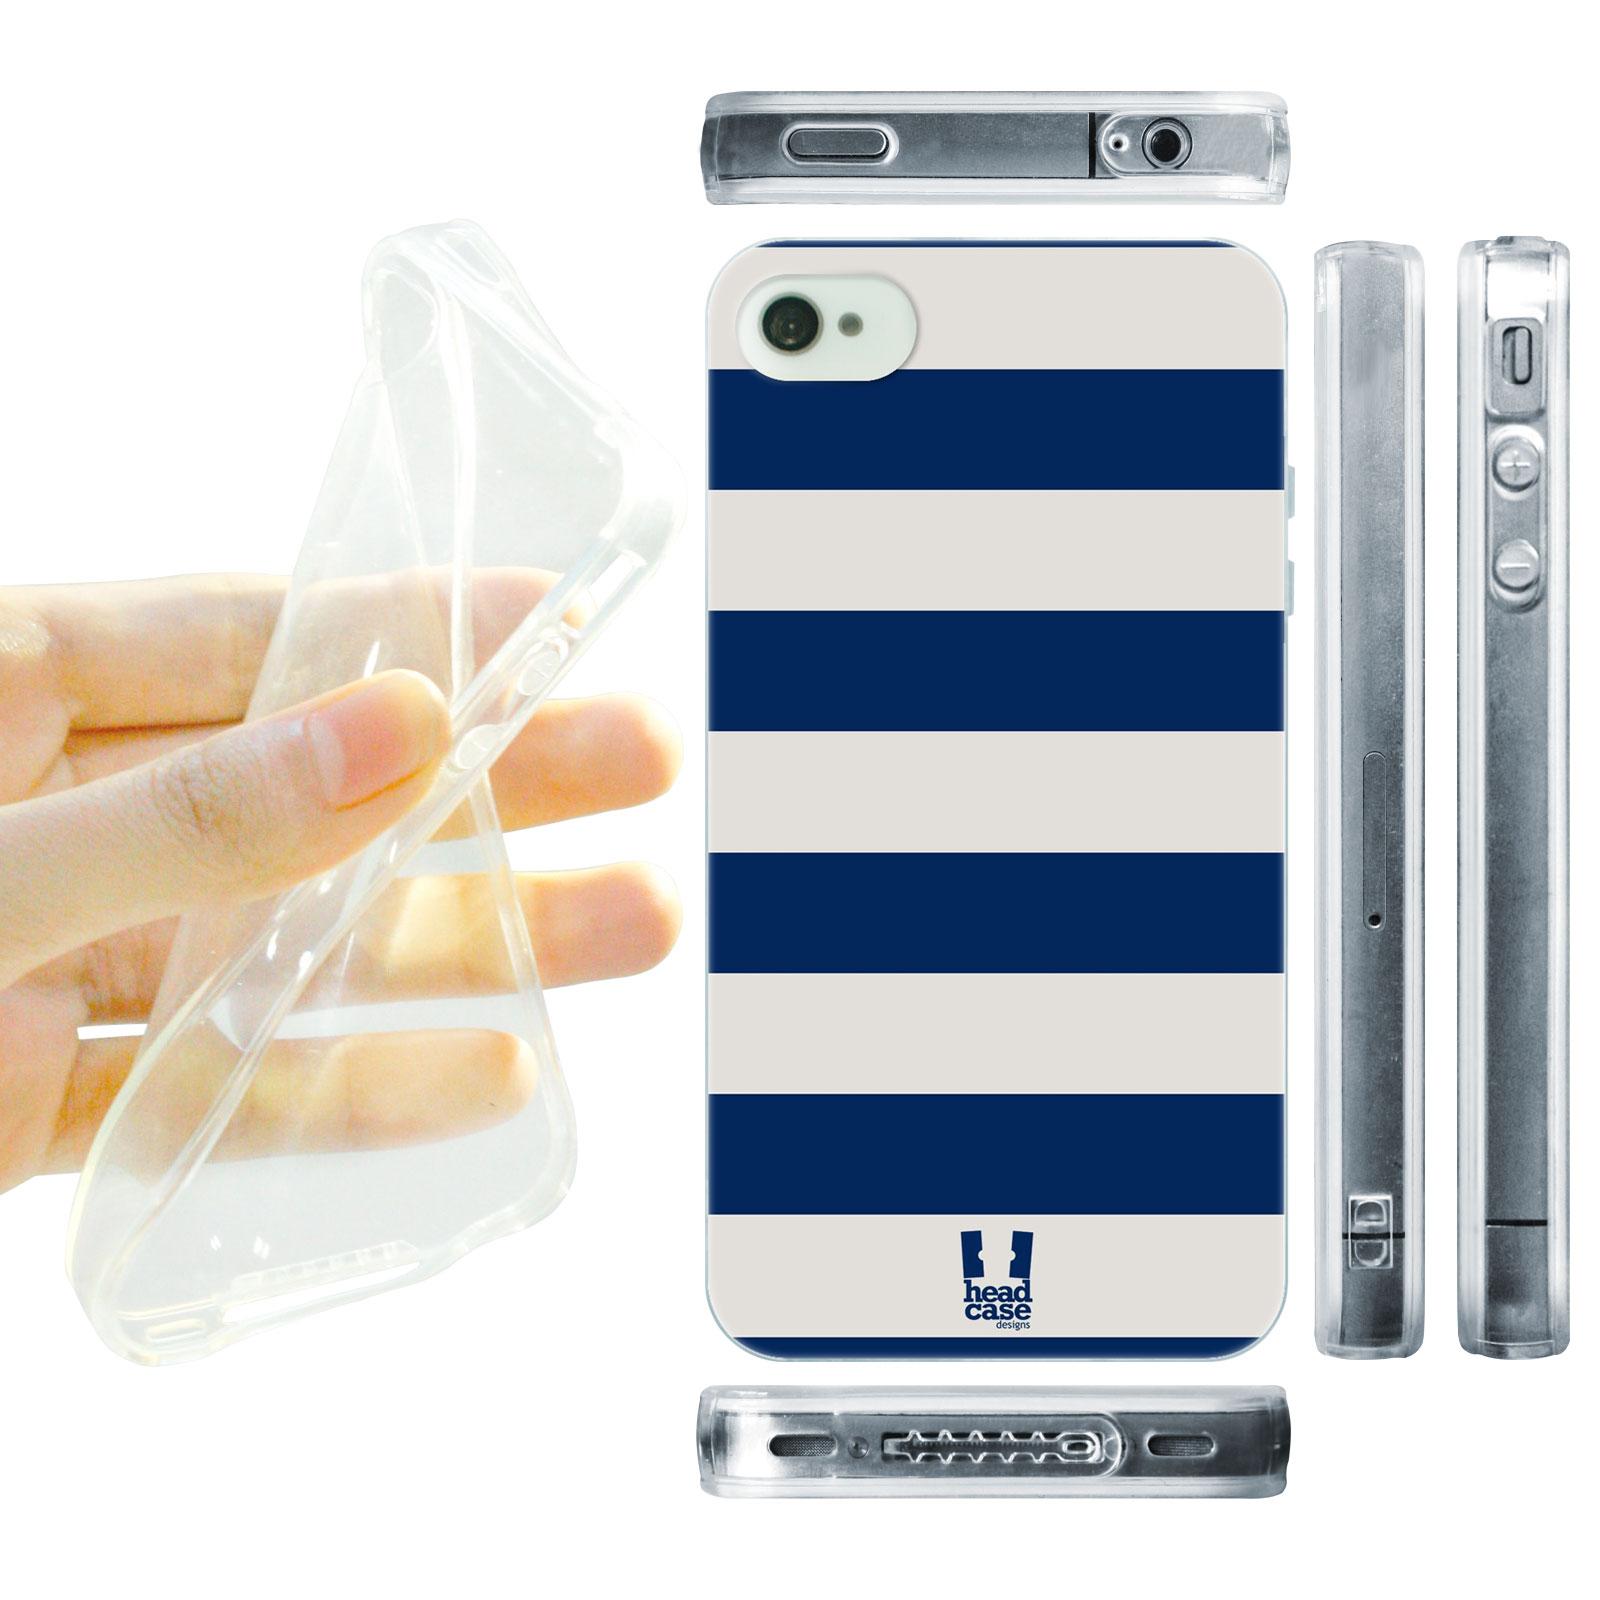 HEAD CASE silikonový obal na mobil Iphone 4/4S barevné pruhy modrá barva námořník